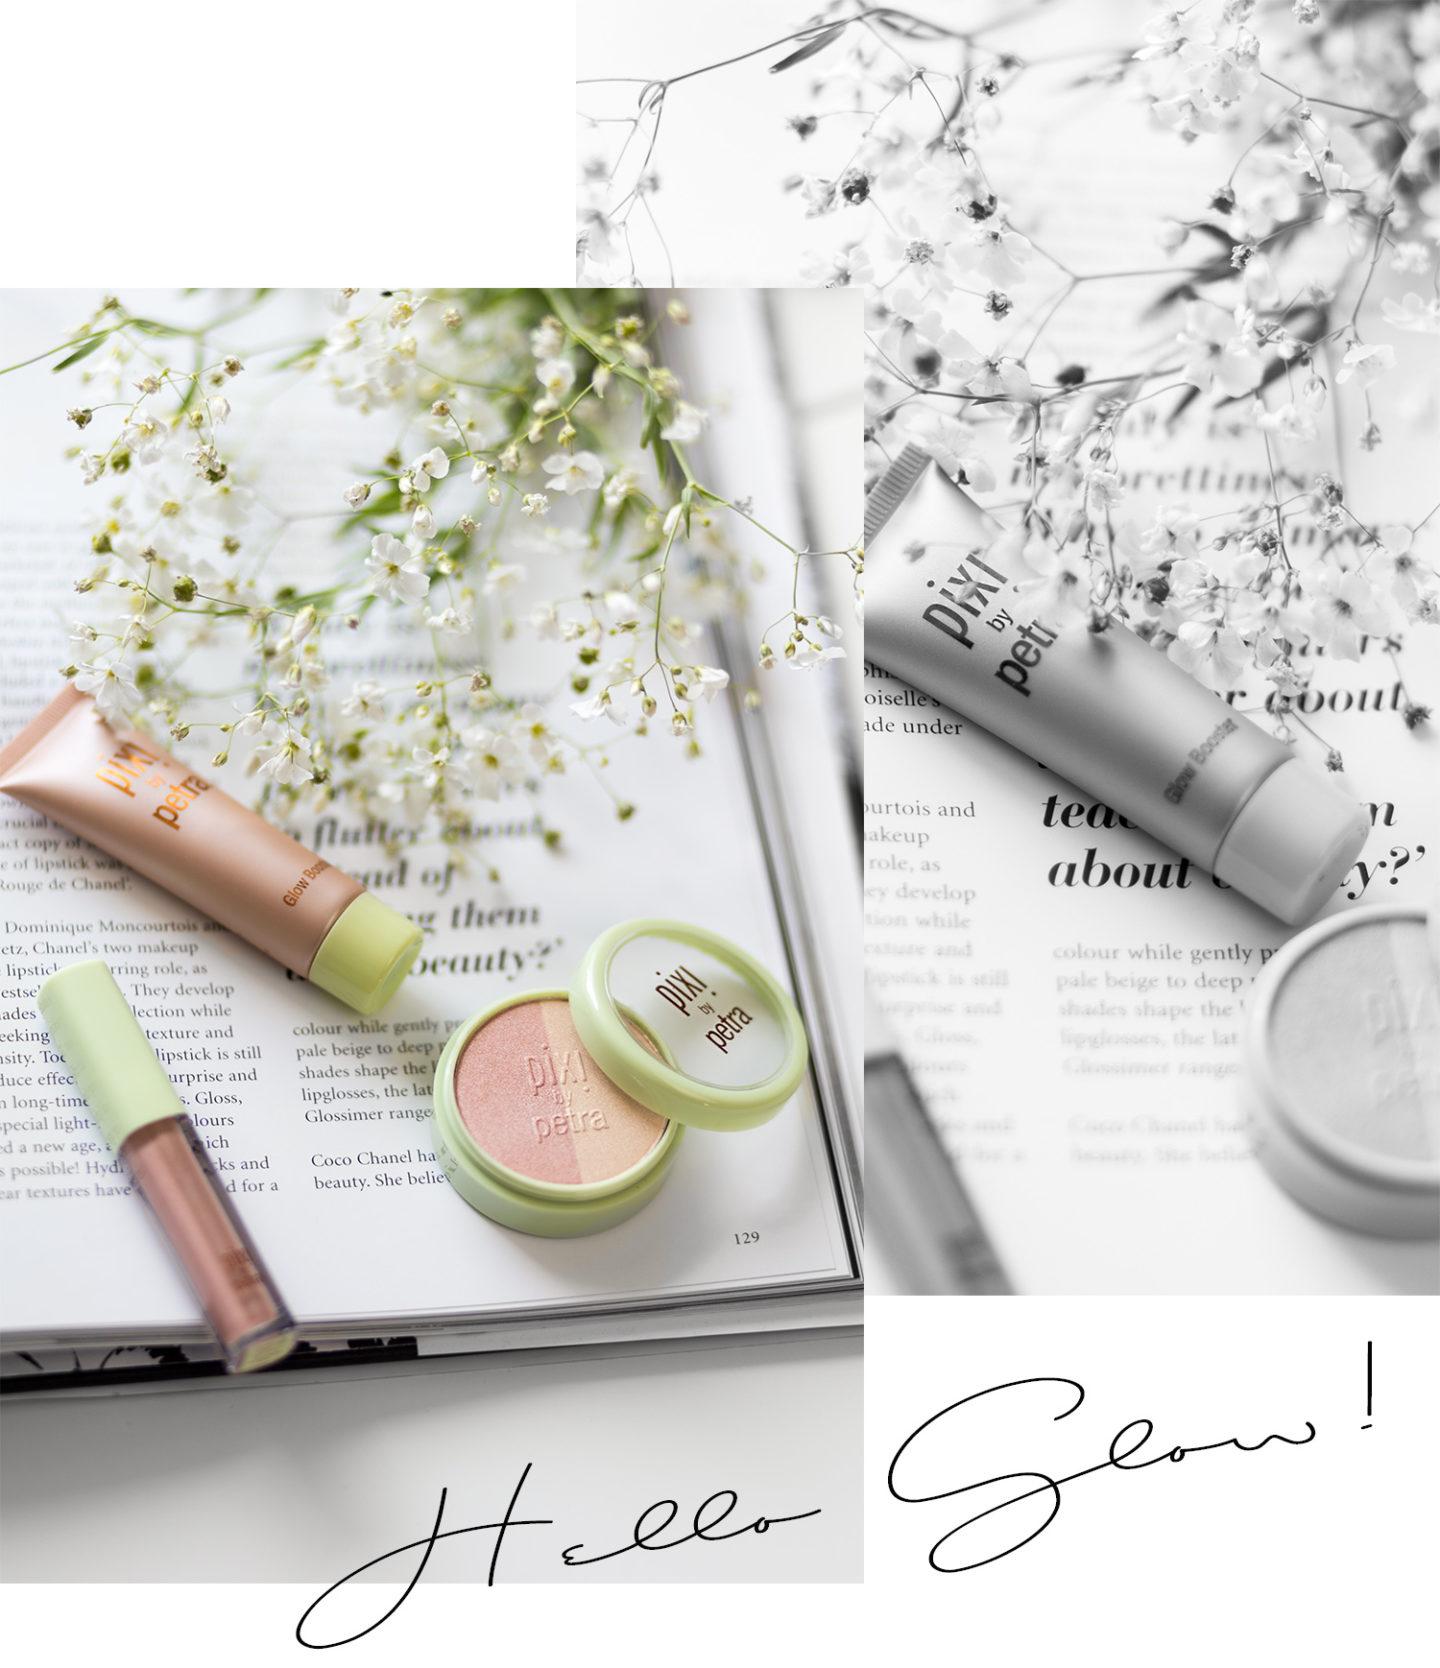 neuheiten-von pixi-hello-glow-set-beauty-skincare-review-test-erfahrung-strahlende-haut-sommer-bezauberndenana